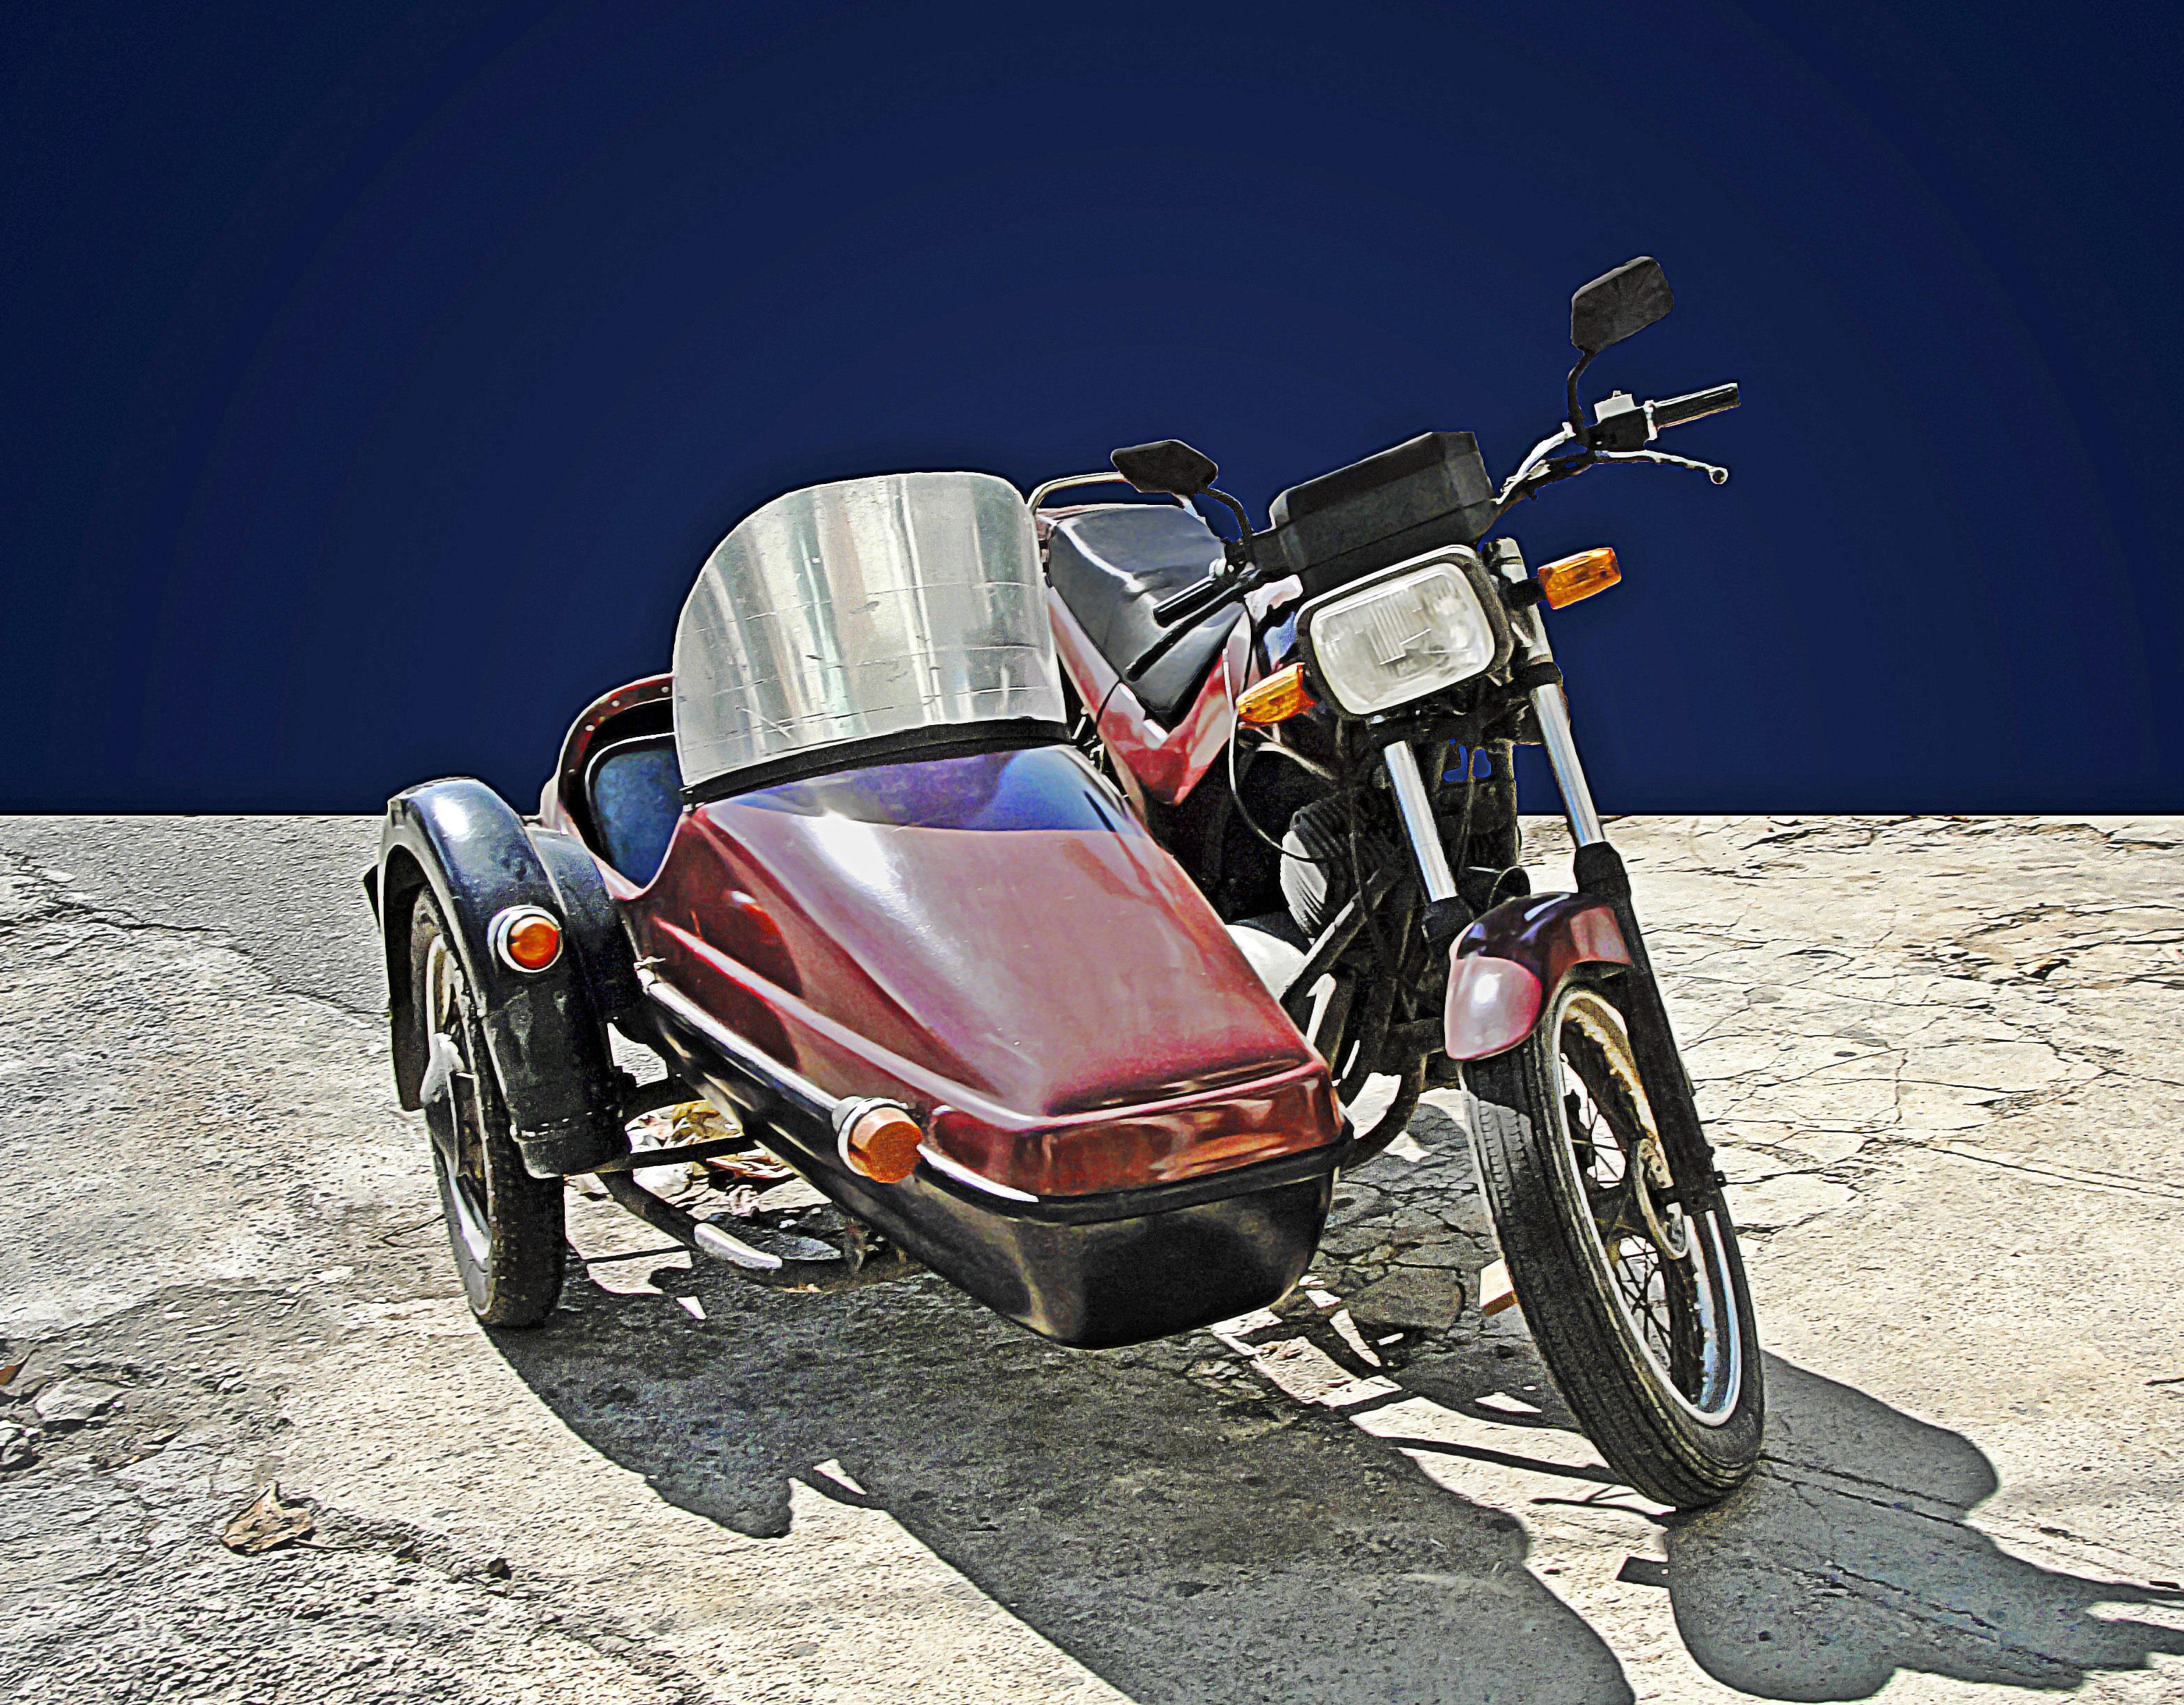 Free Images : car, motorcycle, moto, racing, sidecar, old bike